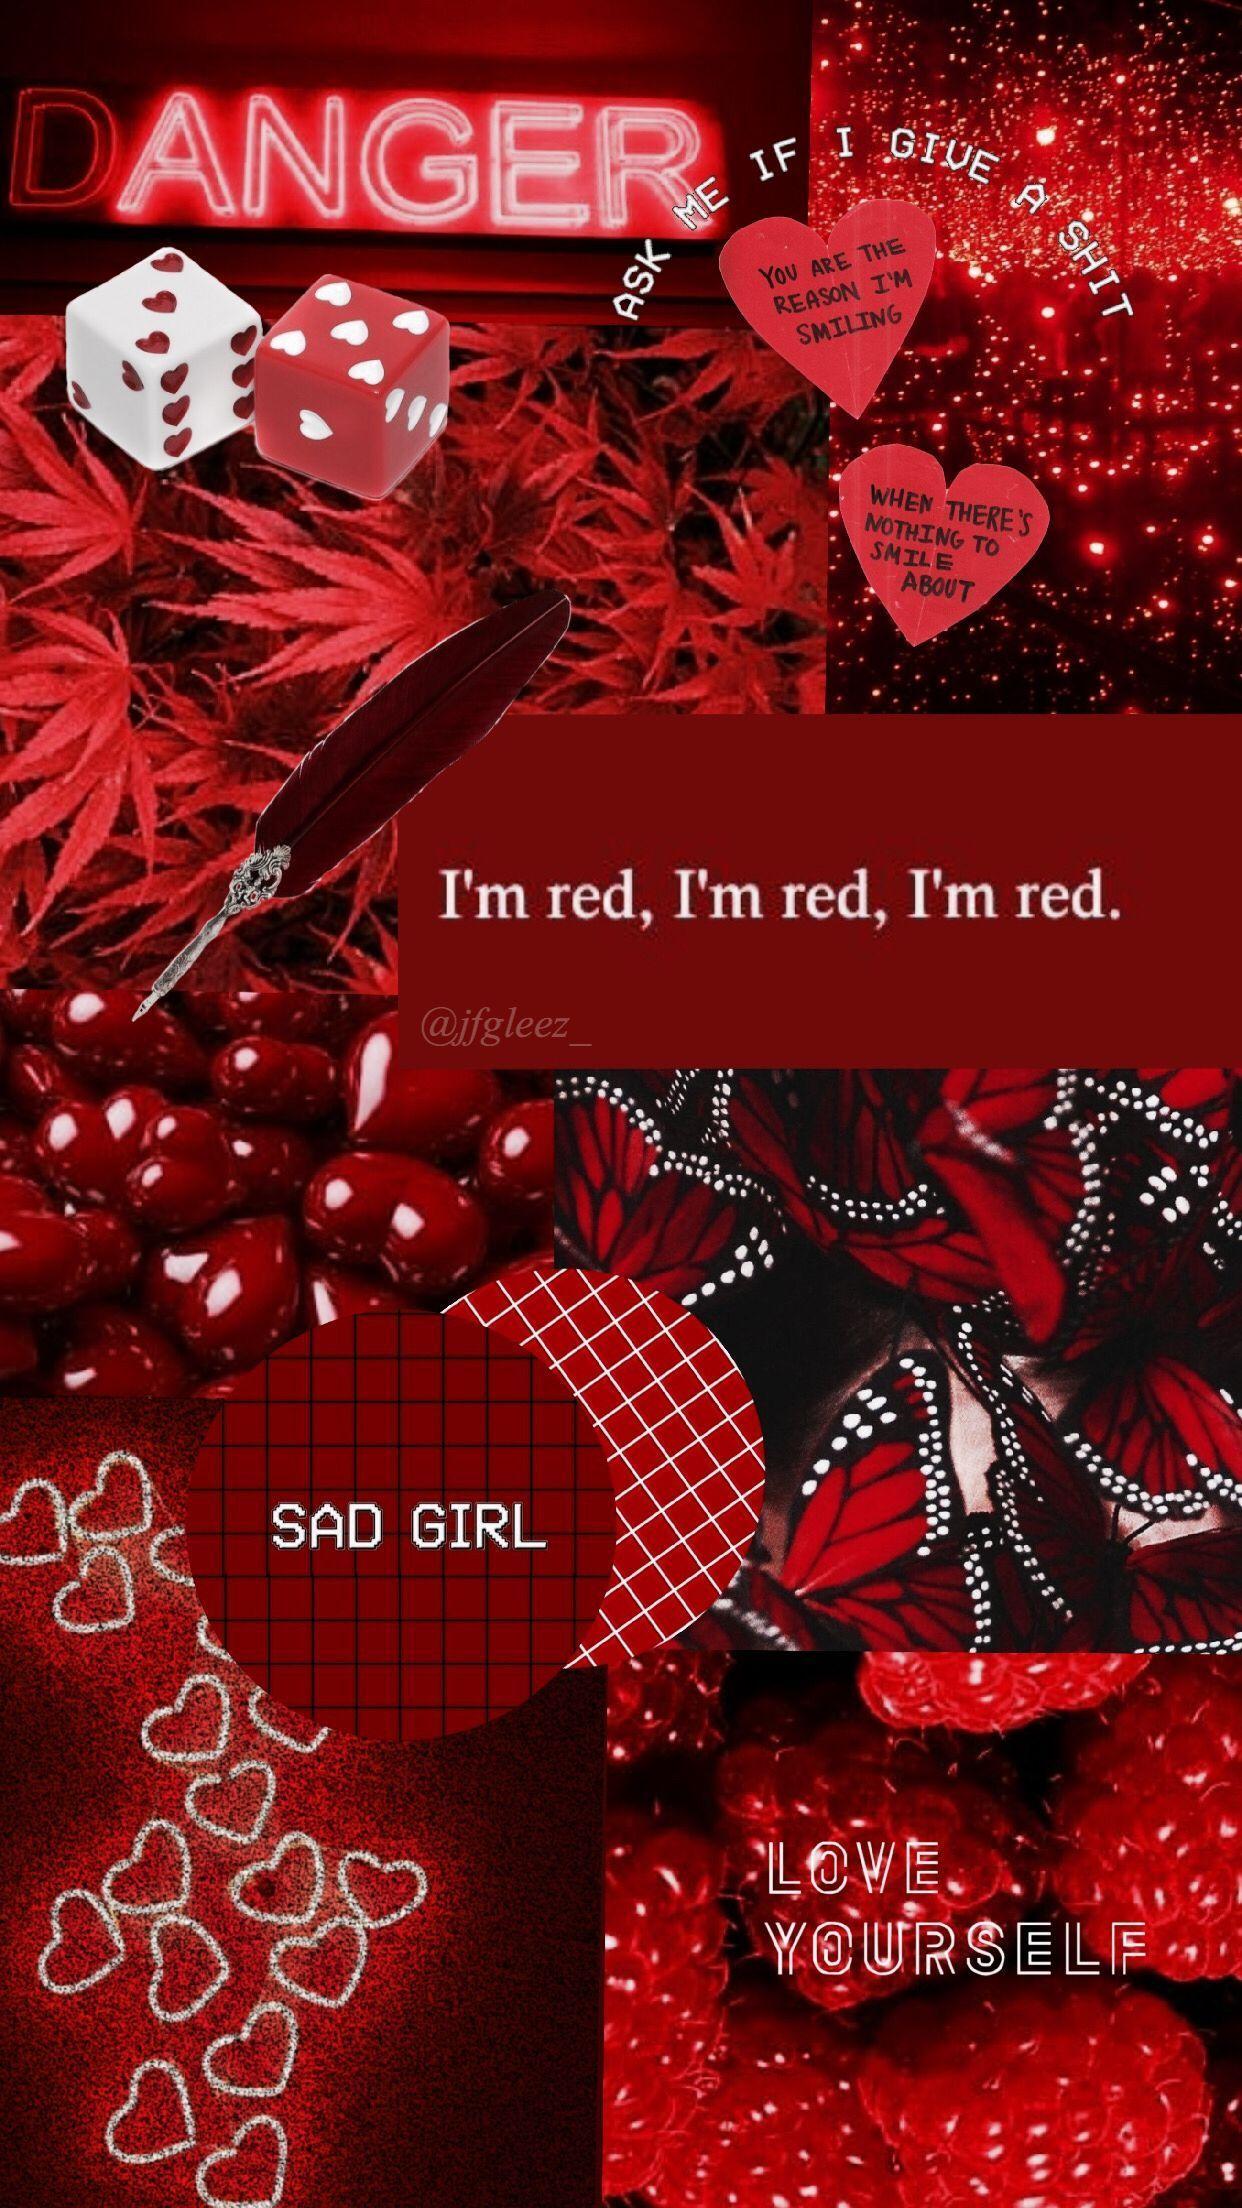 Wallpaper Red Wallpaper Red Black Aesthetic Wallpaper Red Wallpaper Aesthetic Iphone Wallpaper